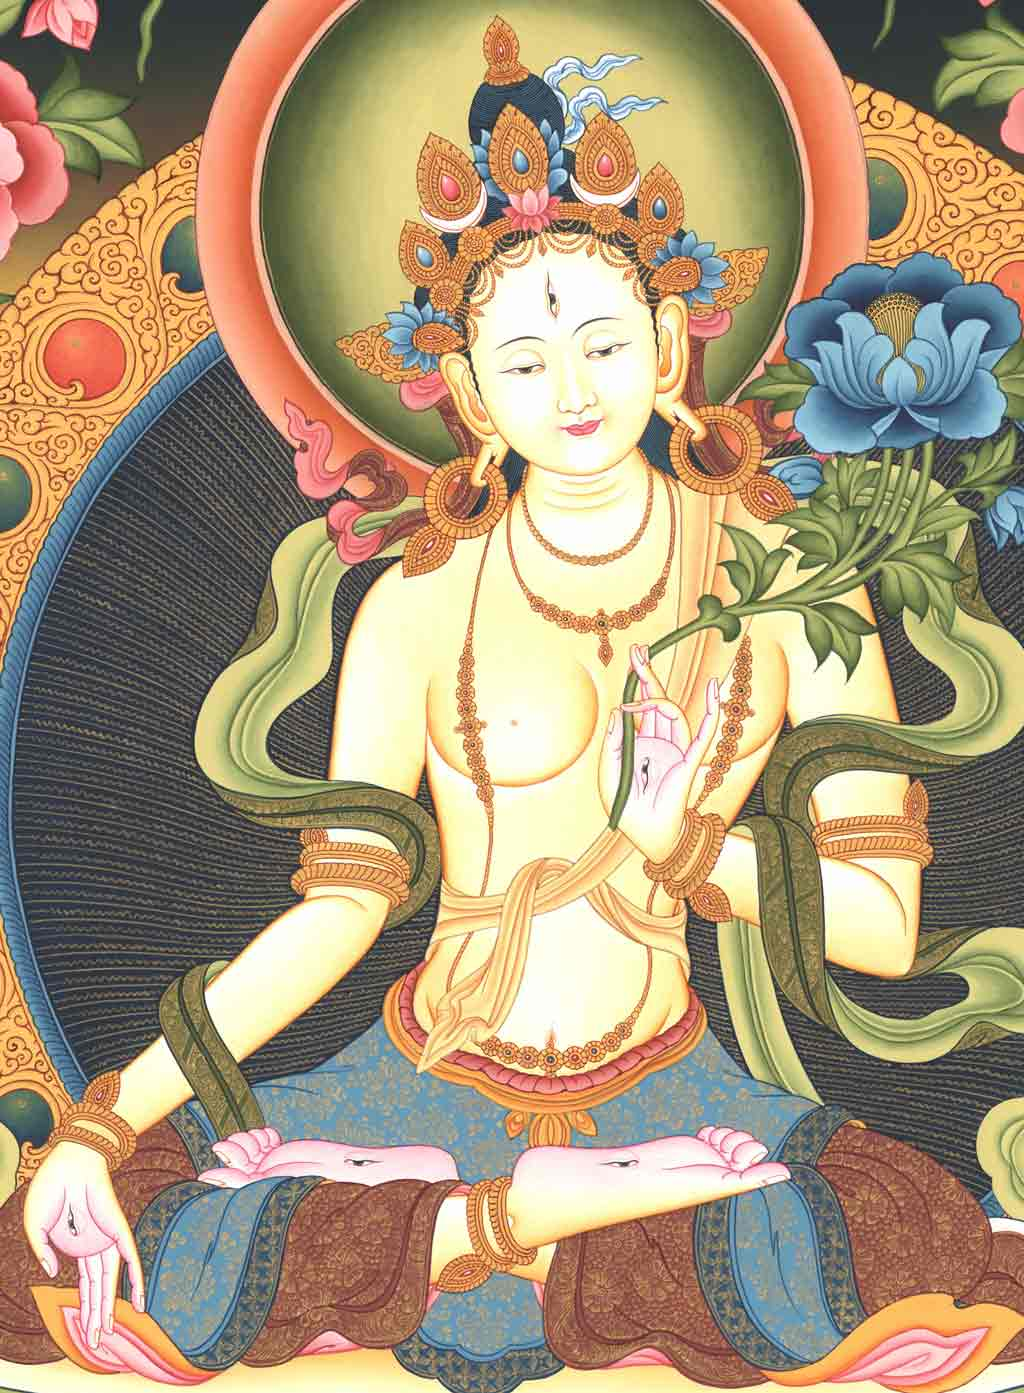 buddhist singles in larsen bay Florida dharma groups buddhist and meditation groups, centers and  padmasambhava buddhist center ratnashri sangha of tampa bay 7040 fernleaf ct port richey, fl.